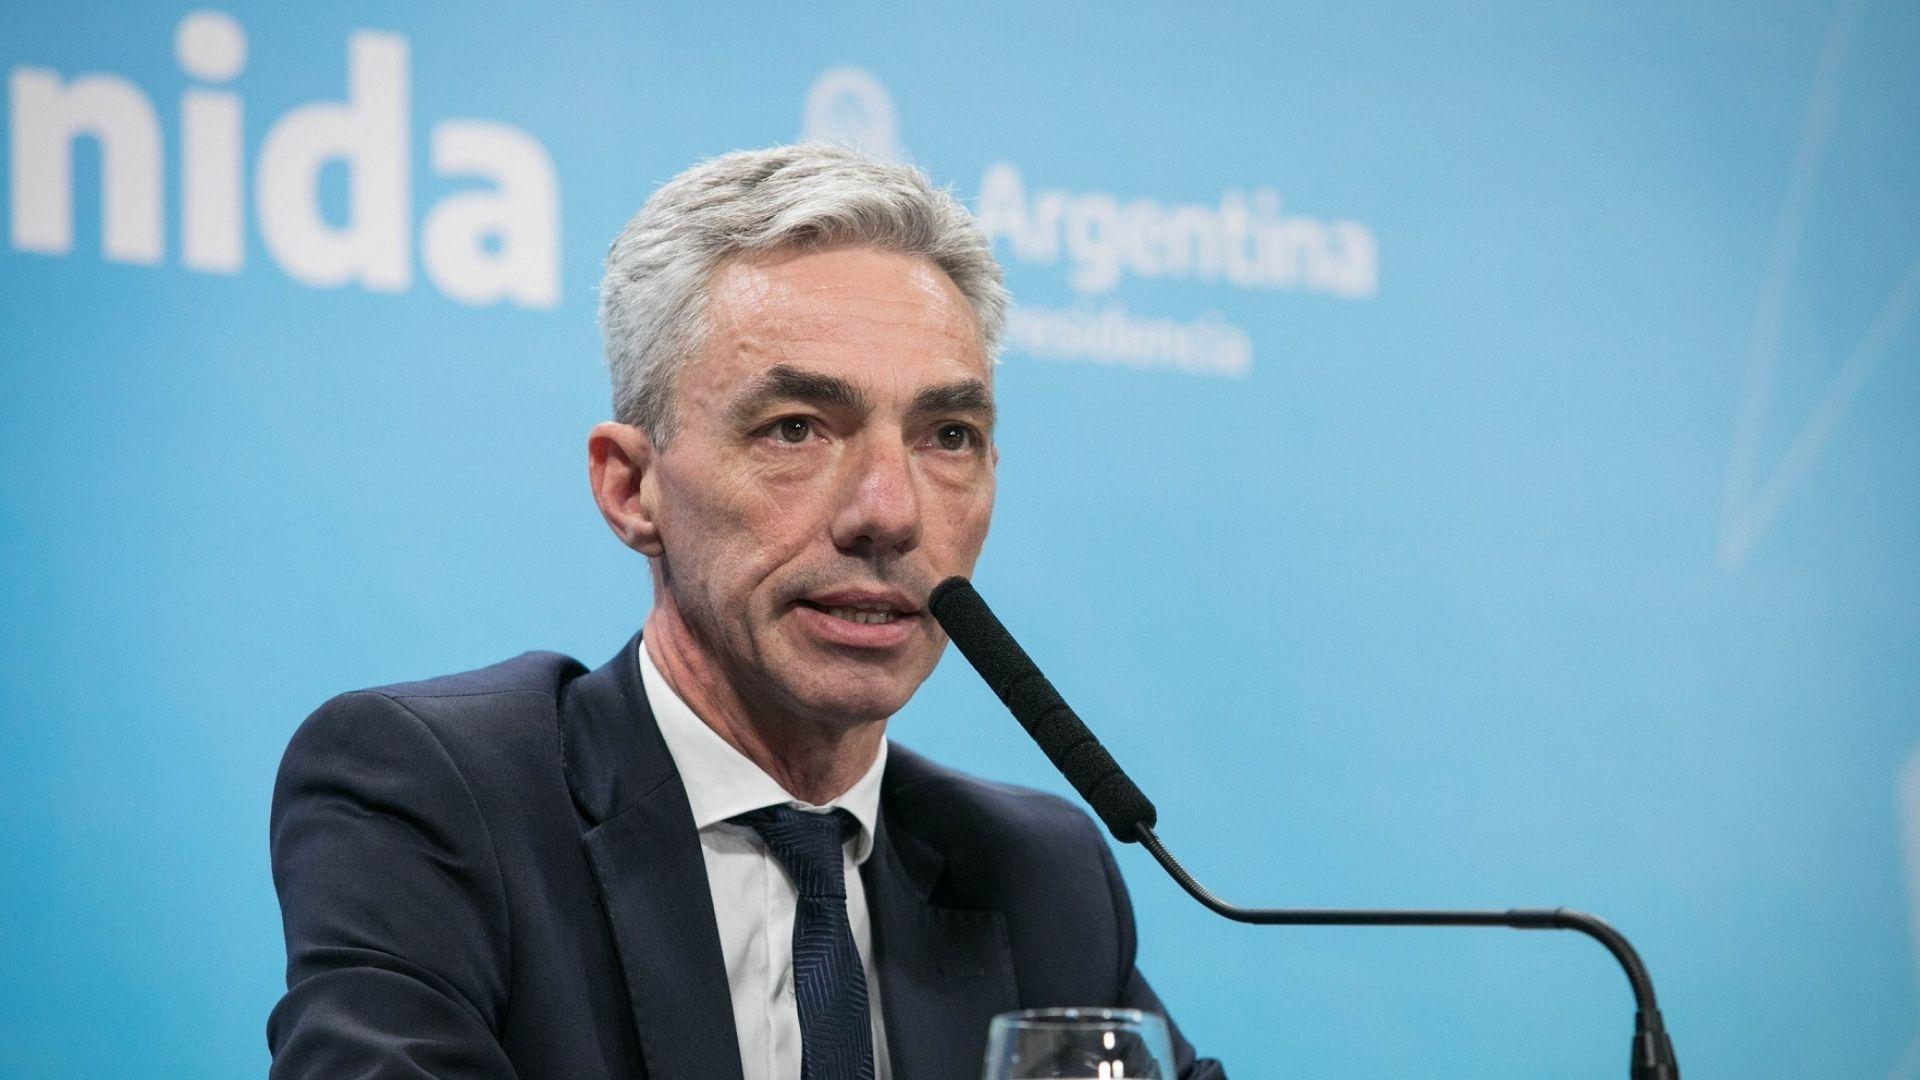 Murió el ministro de Transporte, Mario Meoni